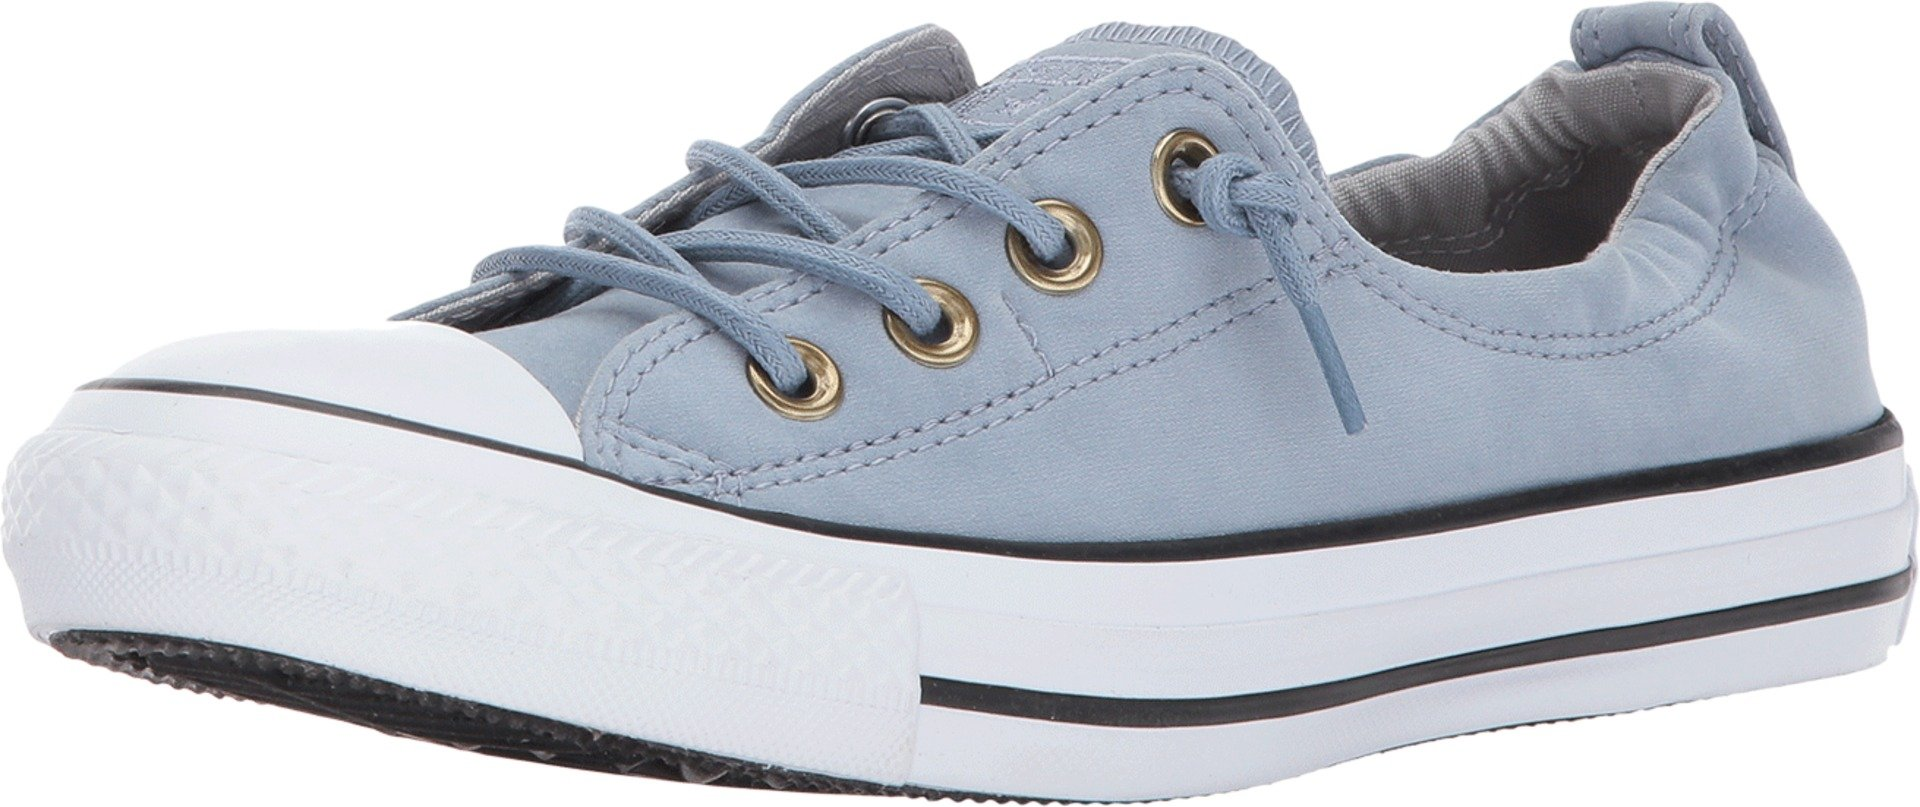 2649e43868f68 Converse Chuck Taylor All Star Shoreline Blue Skate/Ash Grey Lace-Up  Sneaker - 11 B(M) US